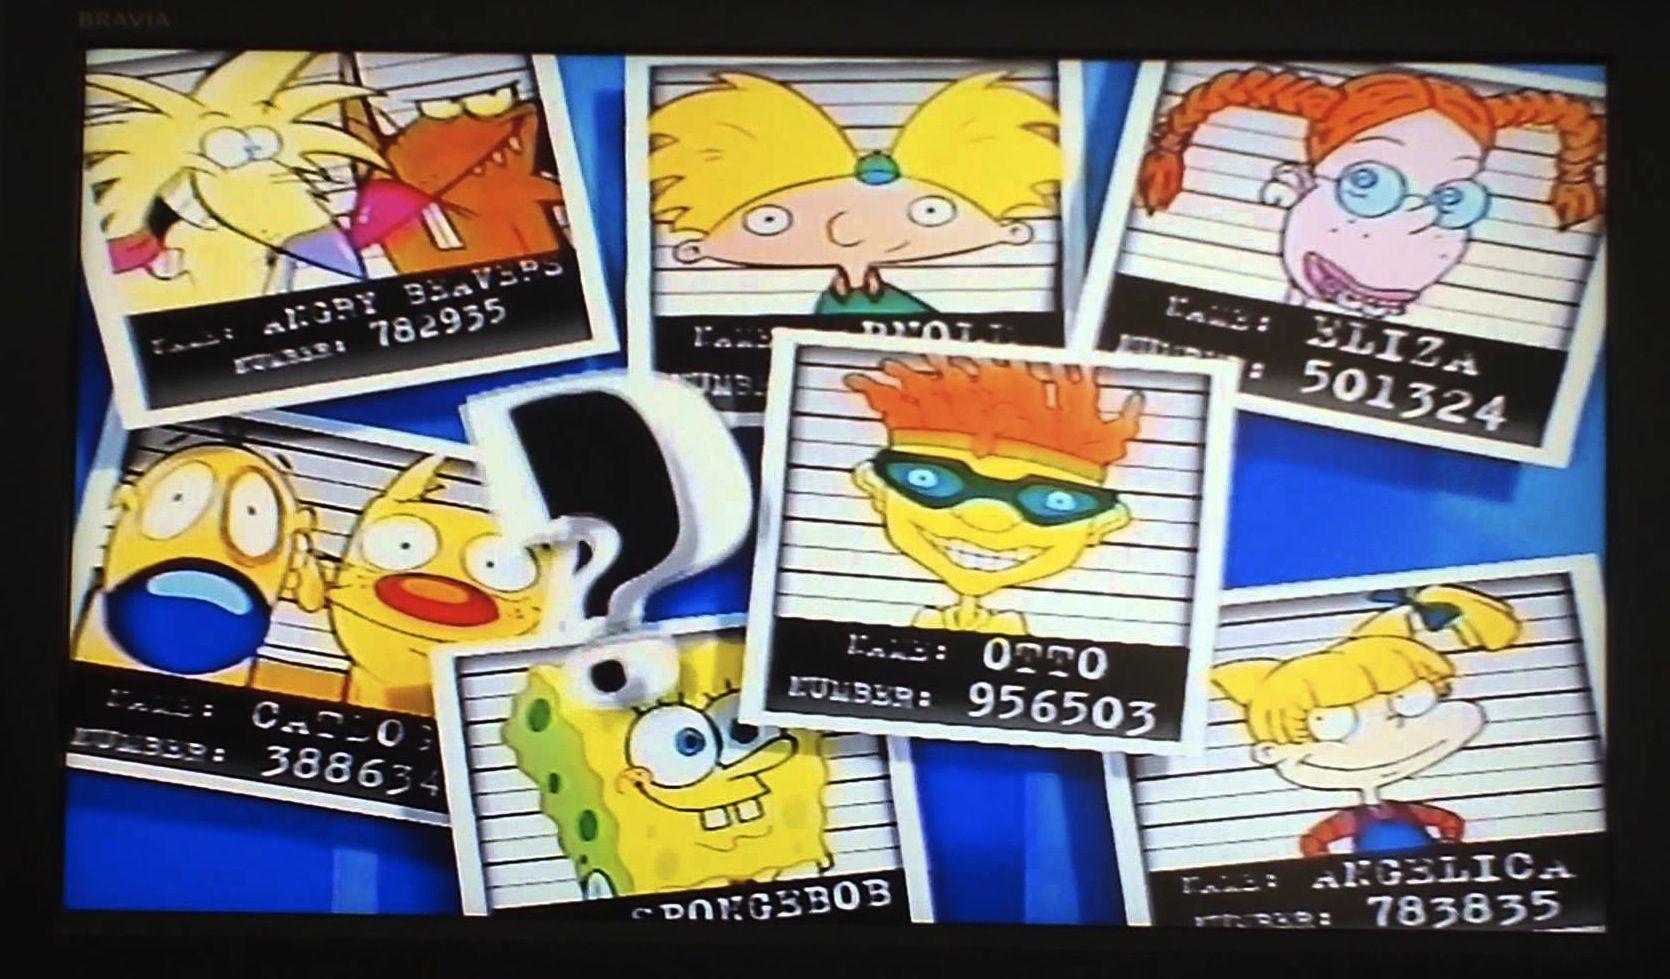 Norm & Daggett, Arnold, Eliza Thornberry, CatDog, Spongebob ...